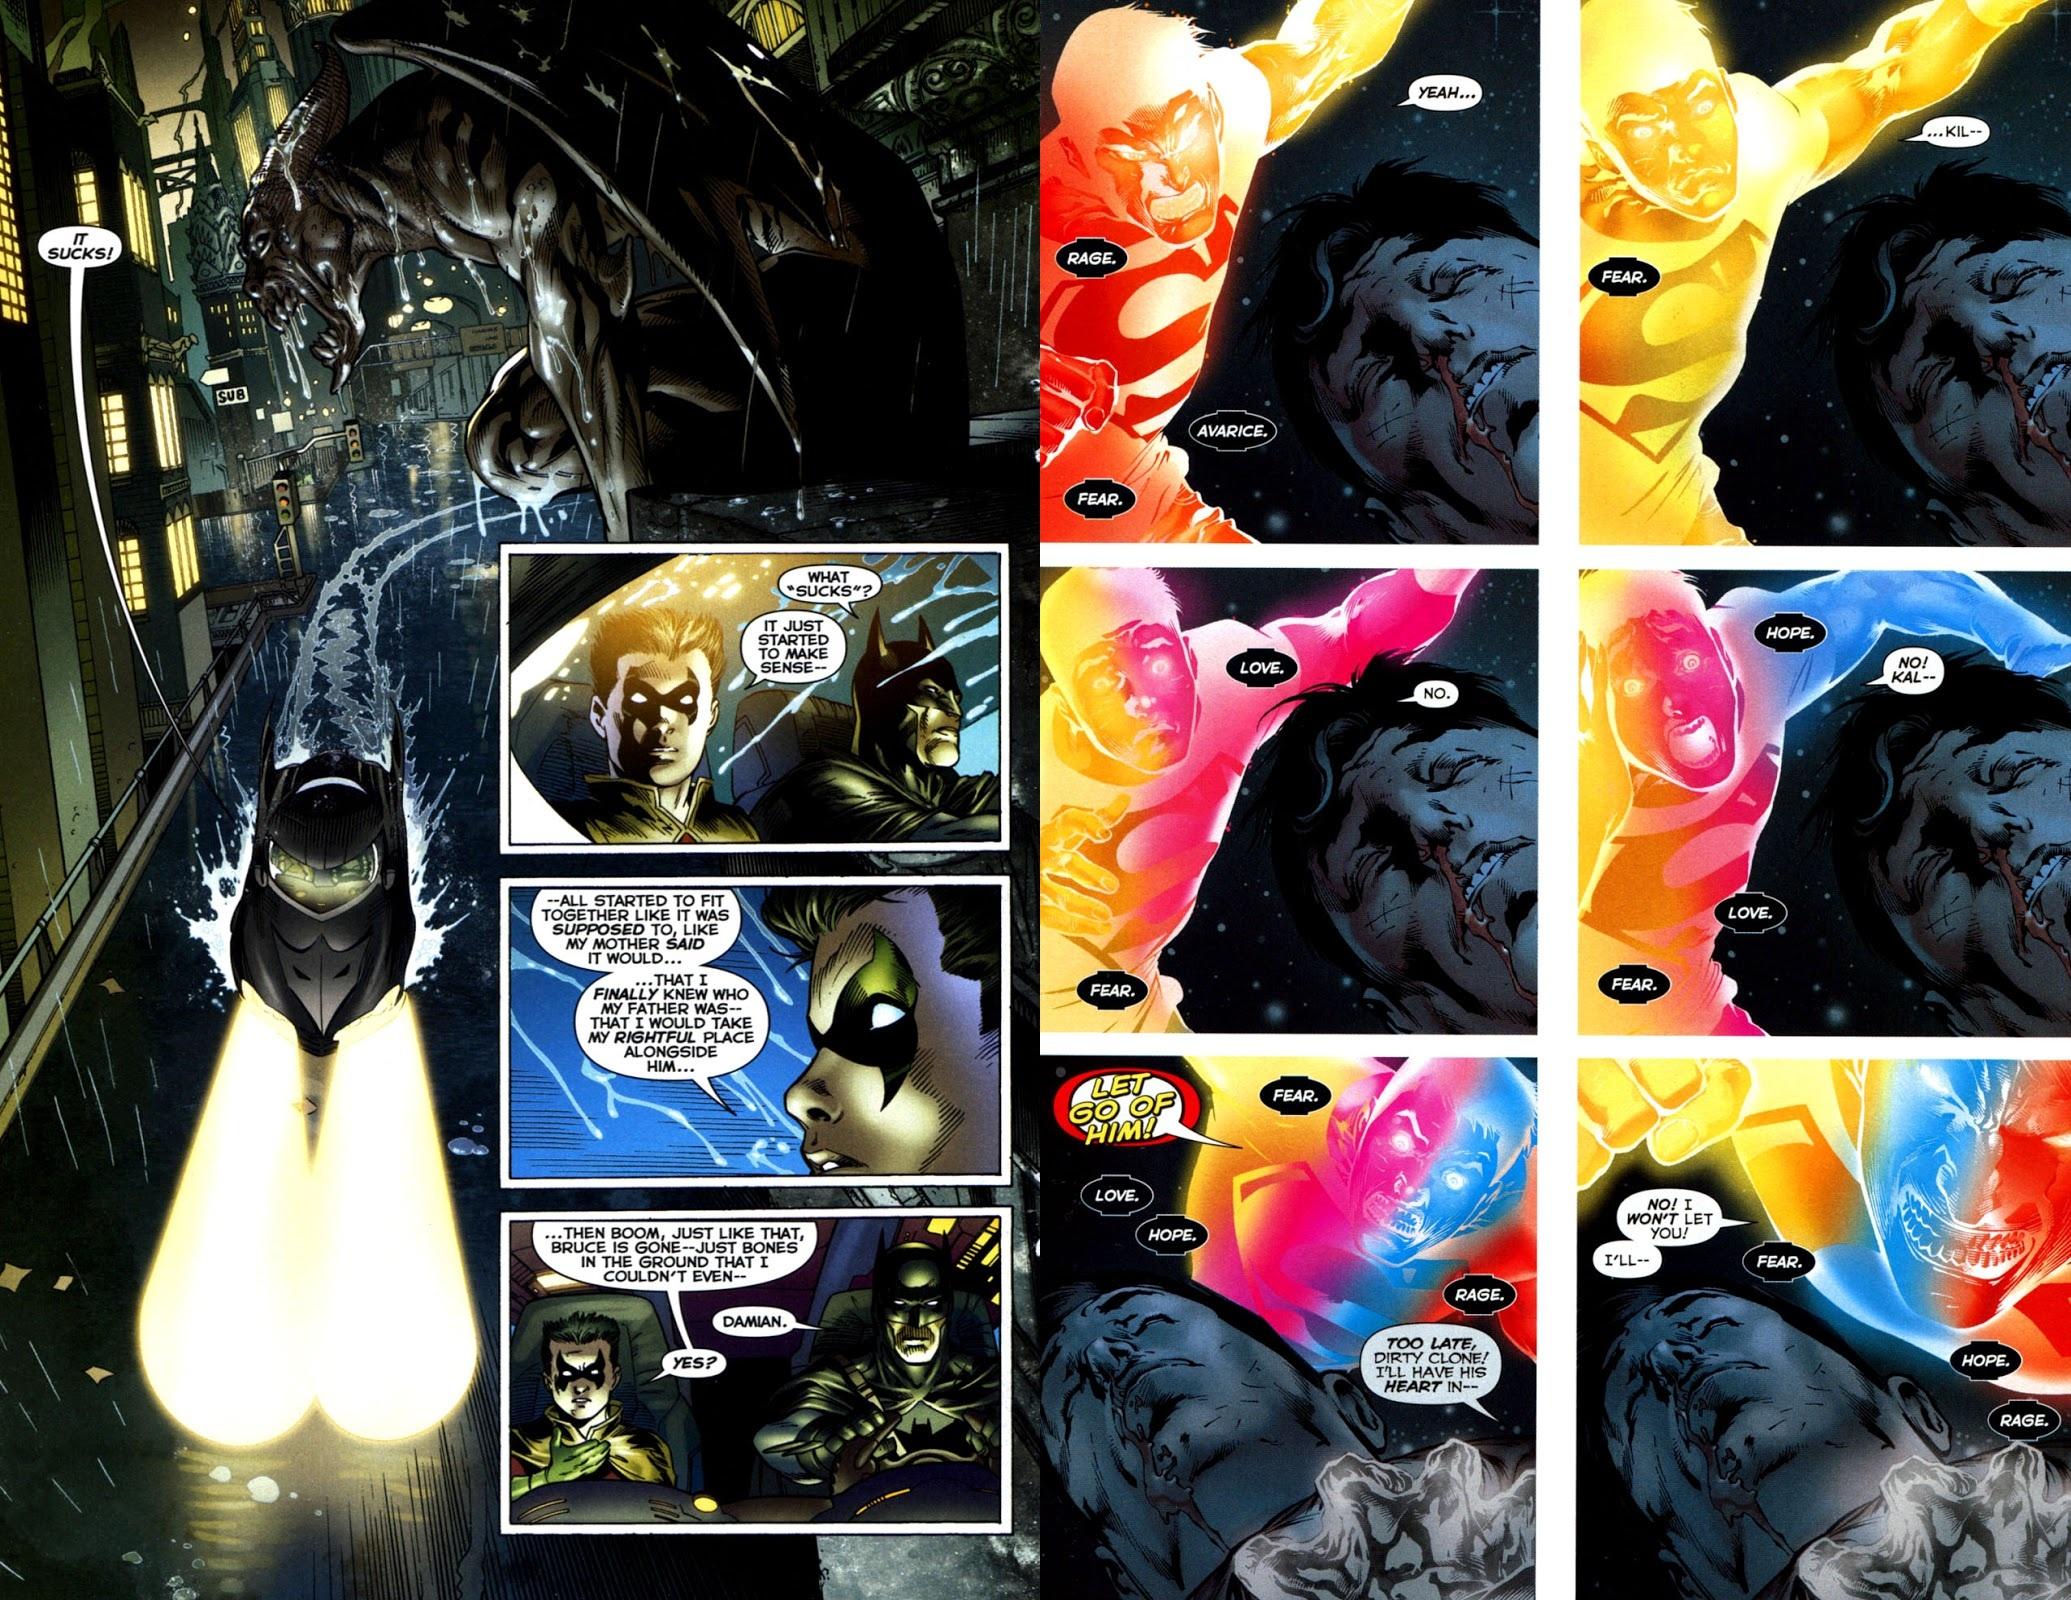 Blackest Night Black Lantern Corps review